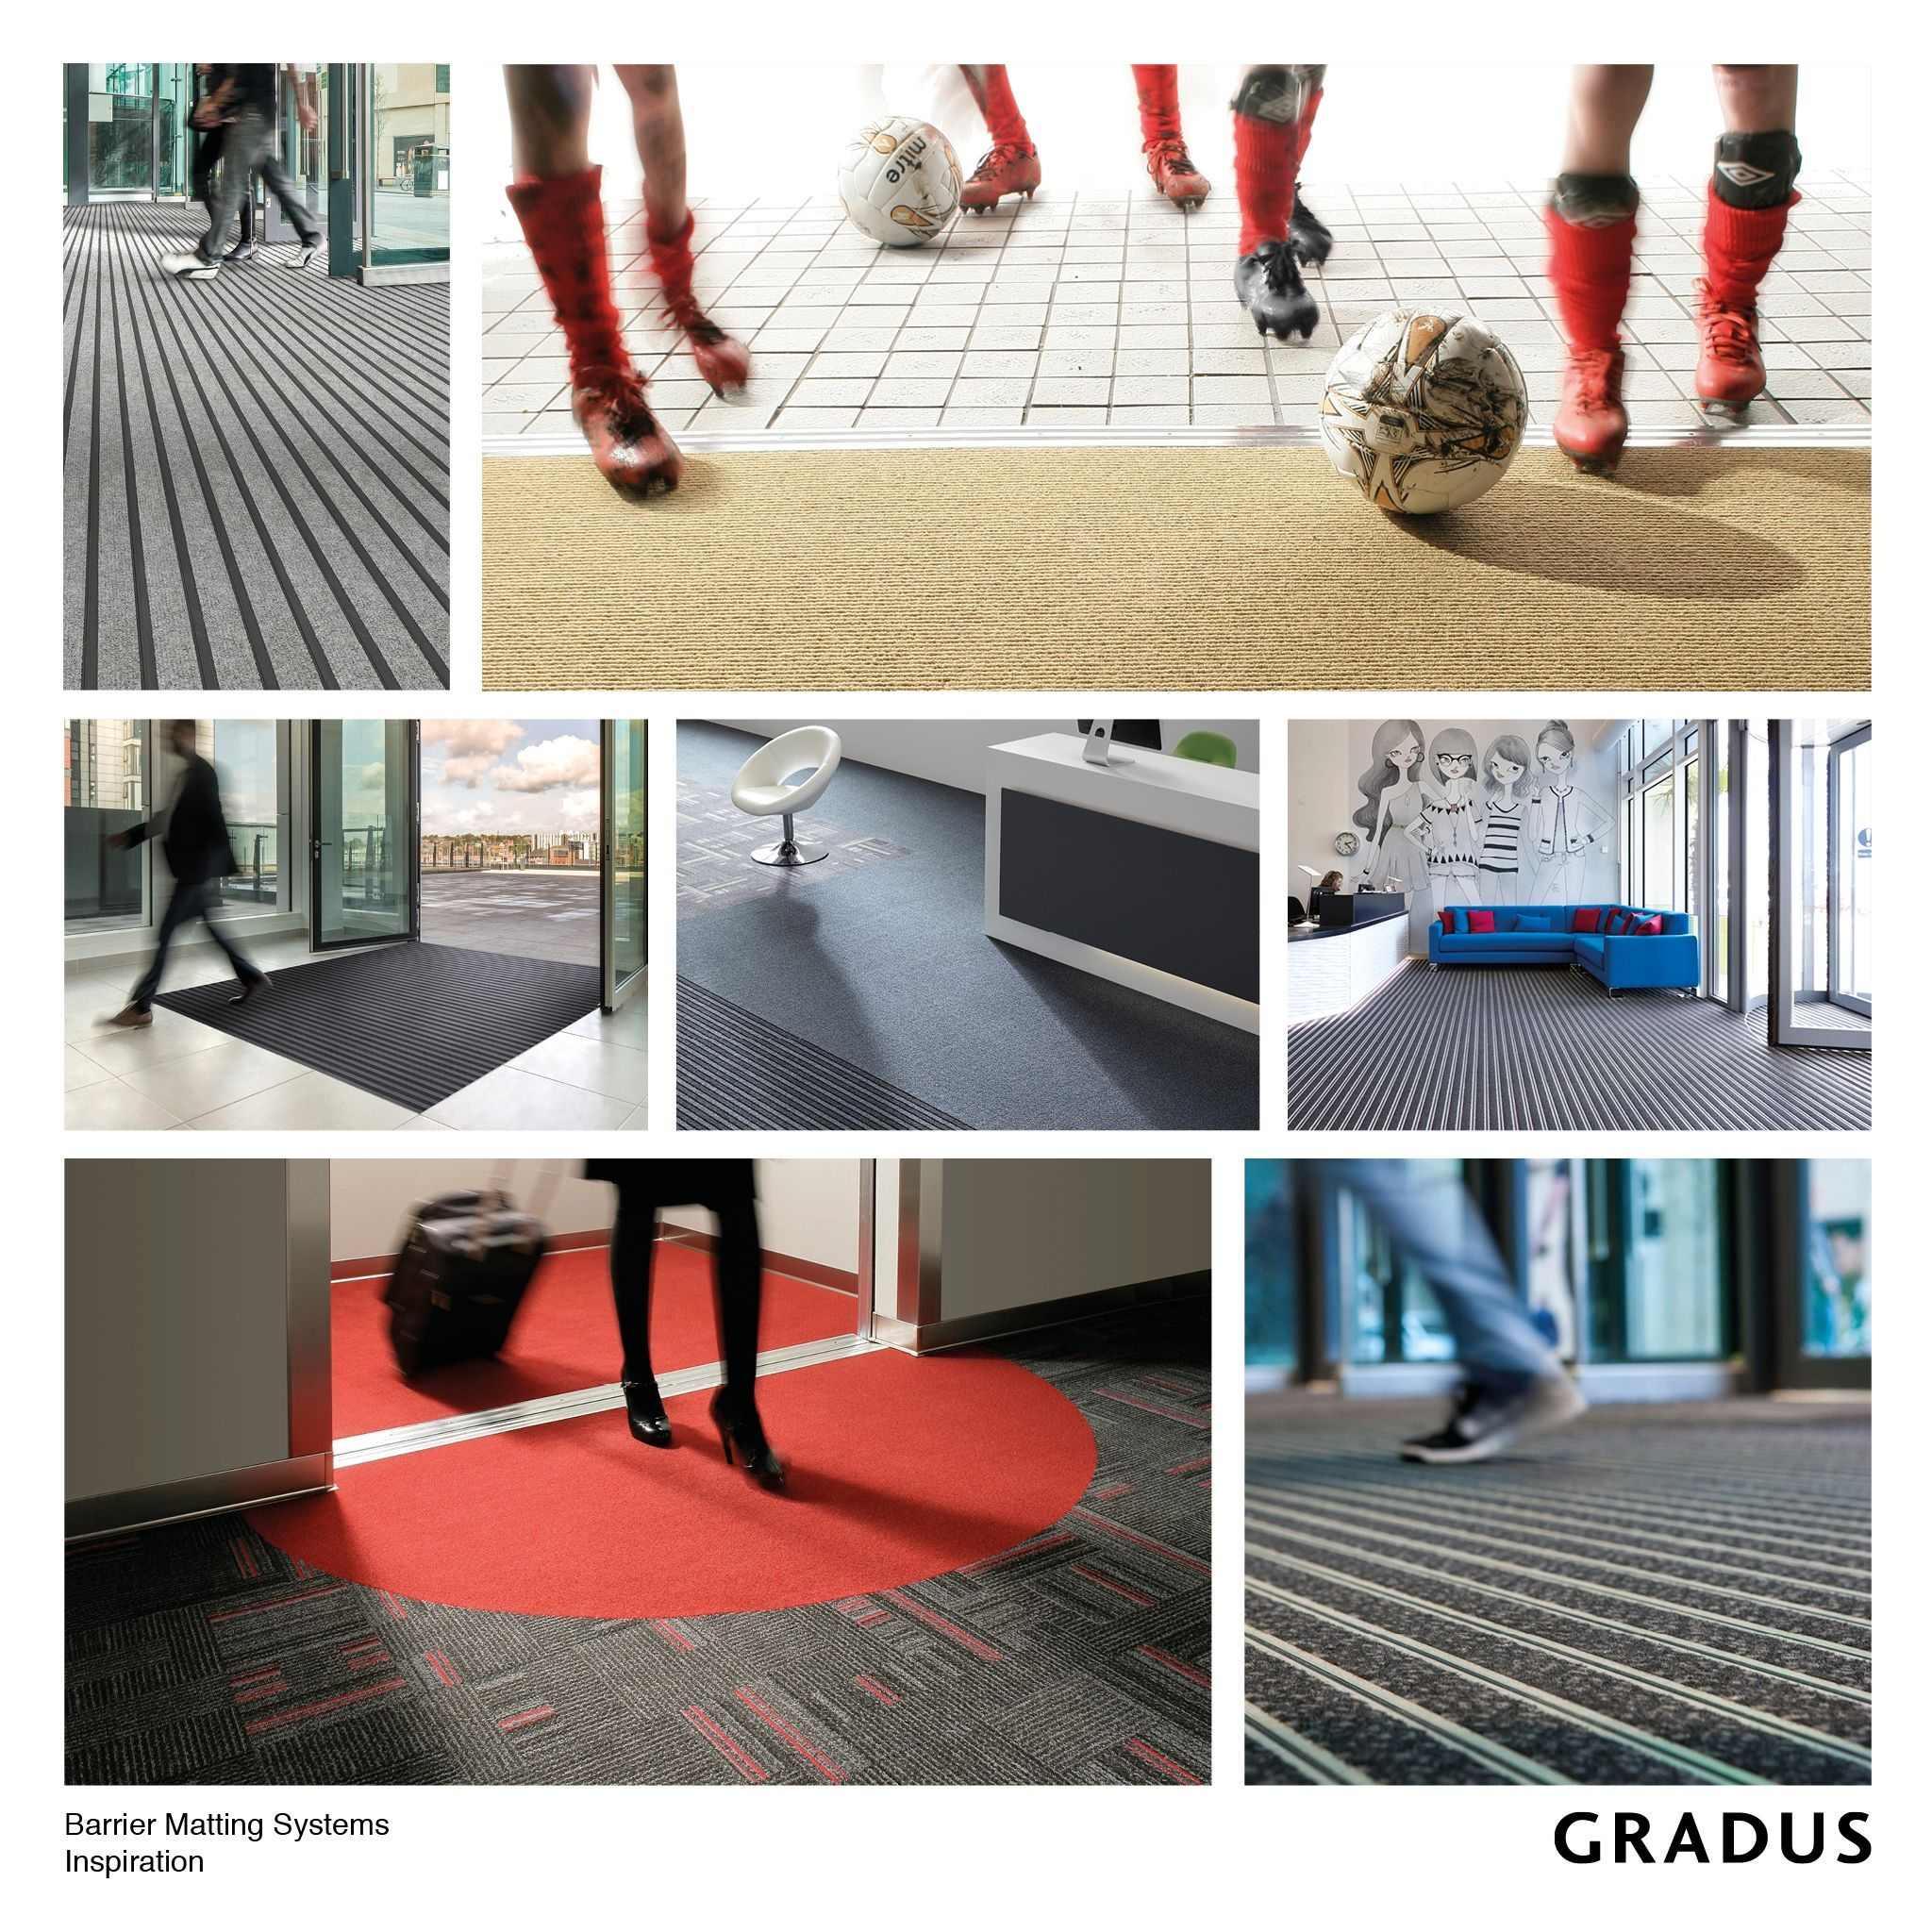 Pin by Gradus on Gradus Barrier Matting System Kids